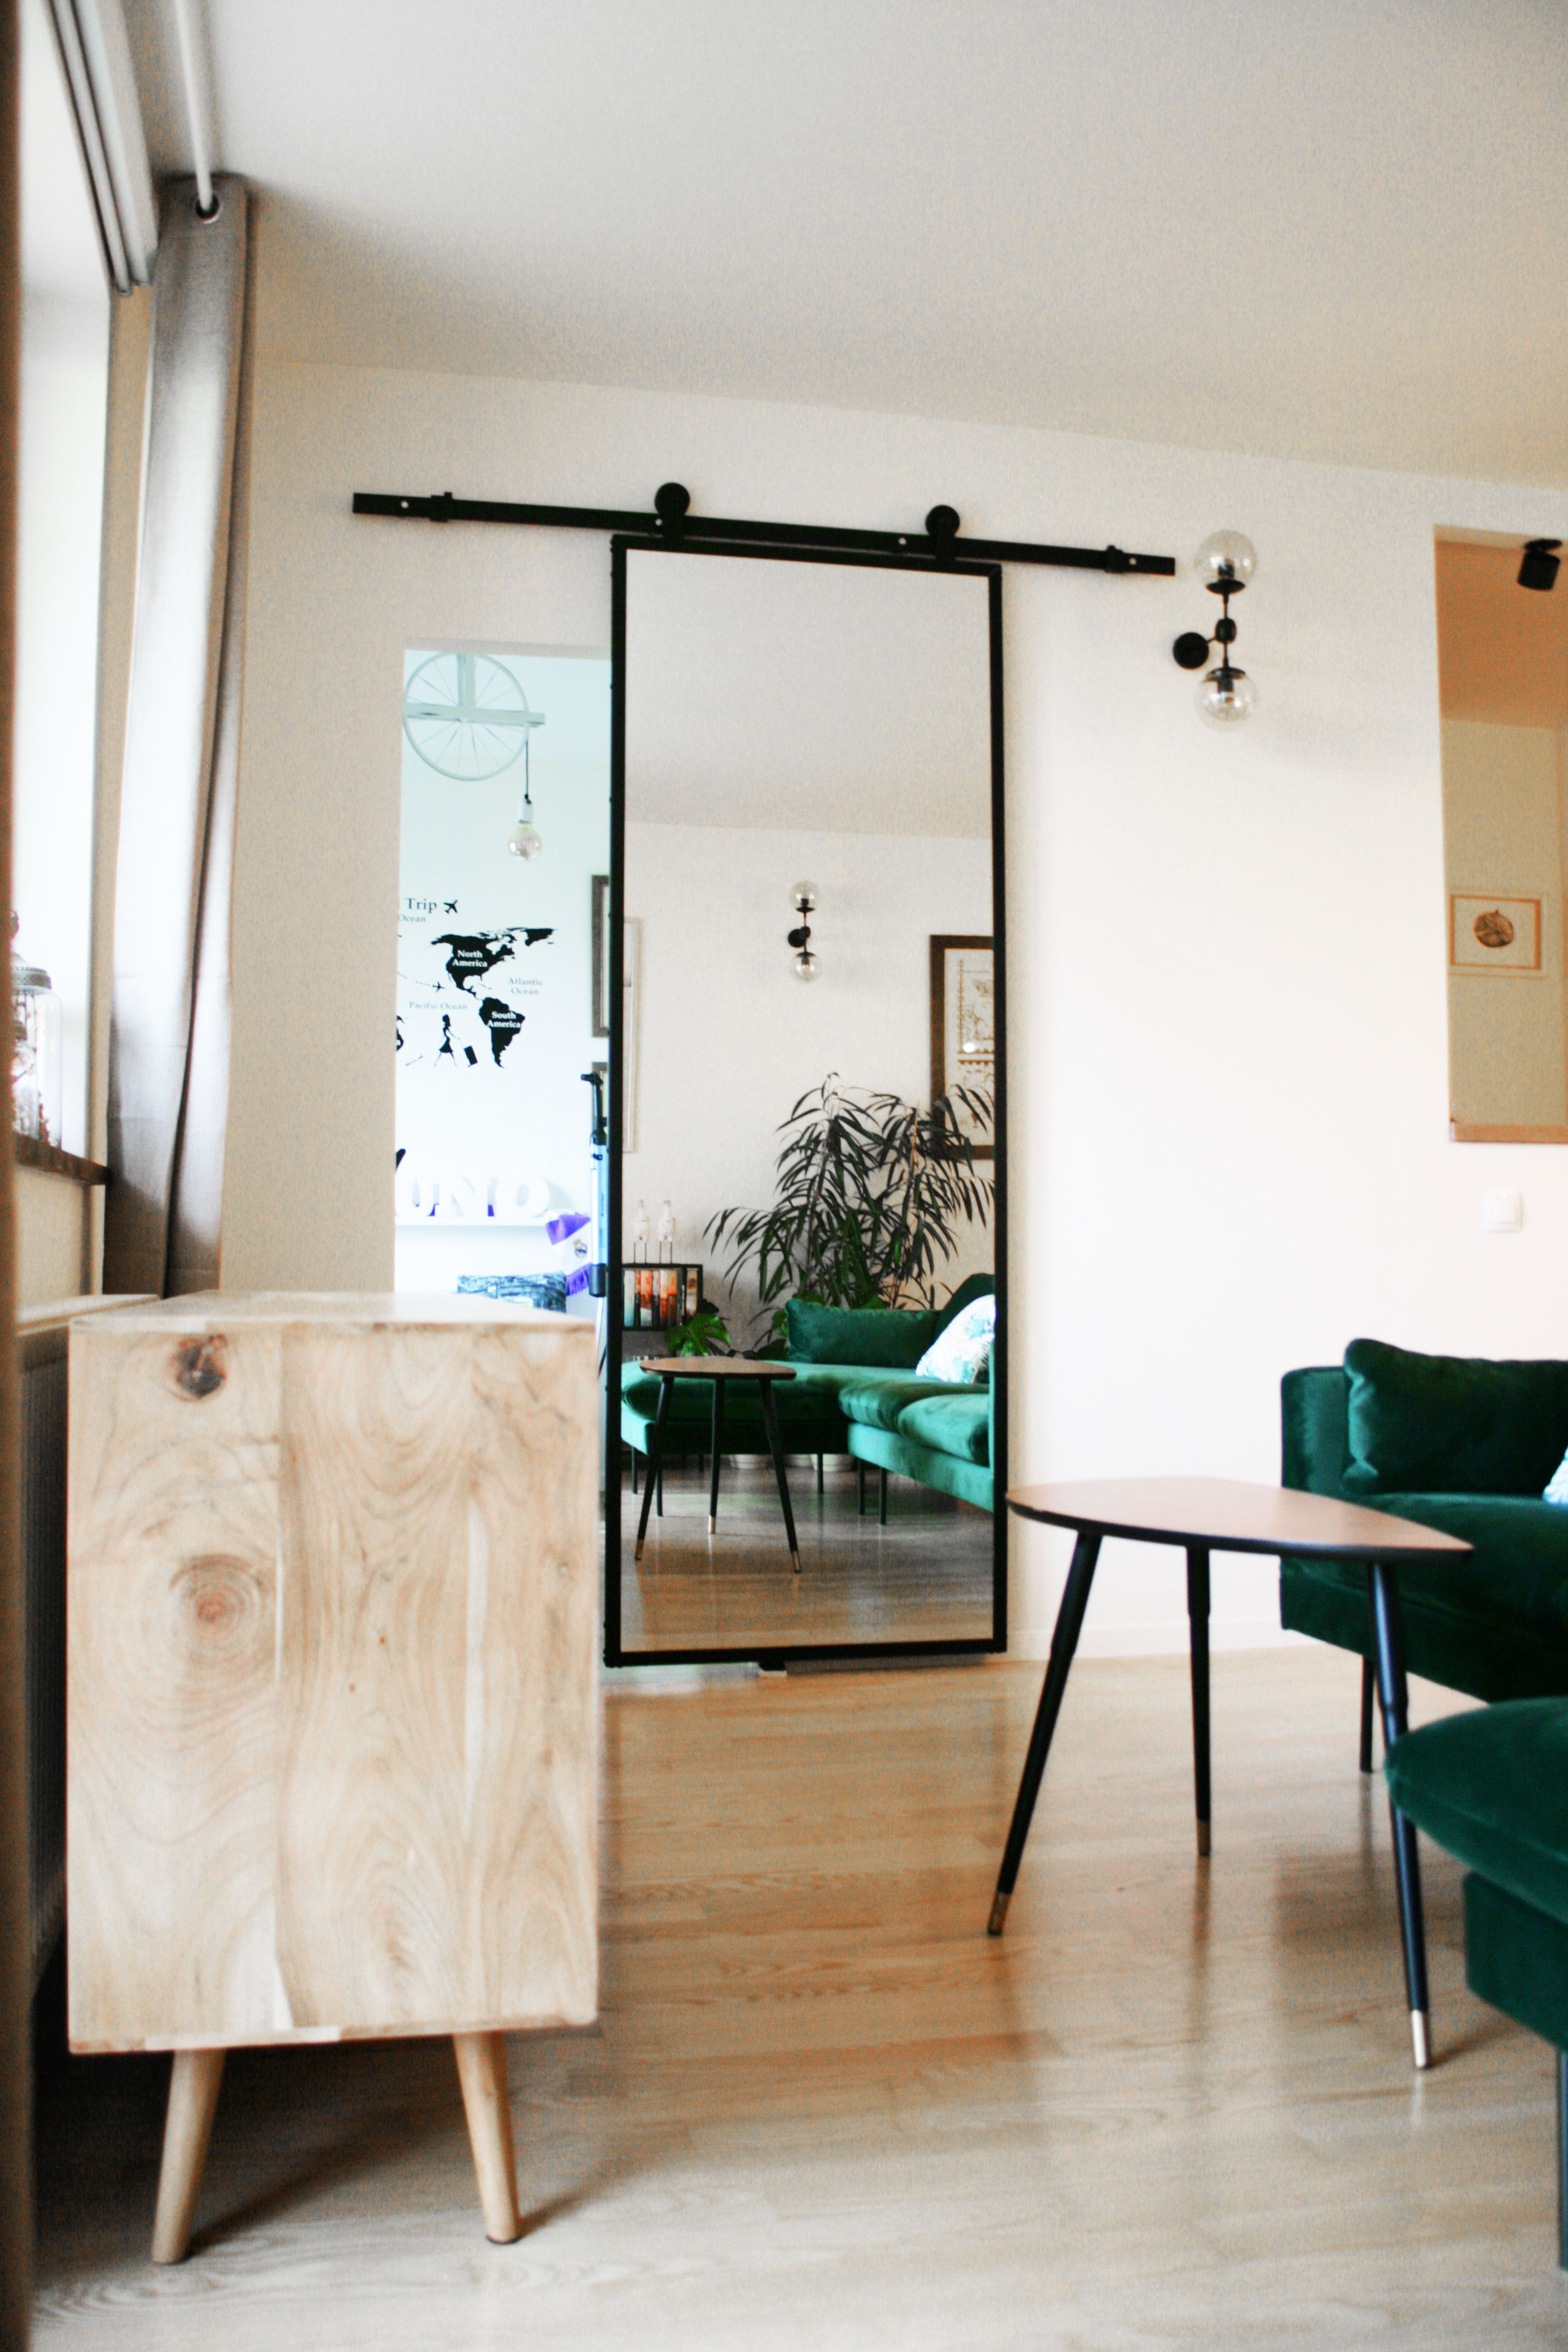 Drzwi Przesuwne Metalowe Model Lara Lustro W Stalowej Ramie Reno Mirror Wall Bedroom Modern Living Room Doors Interior